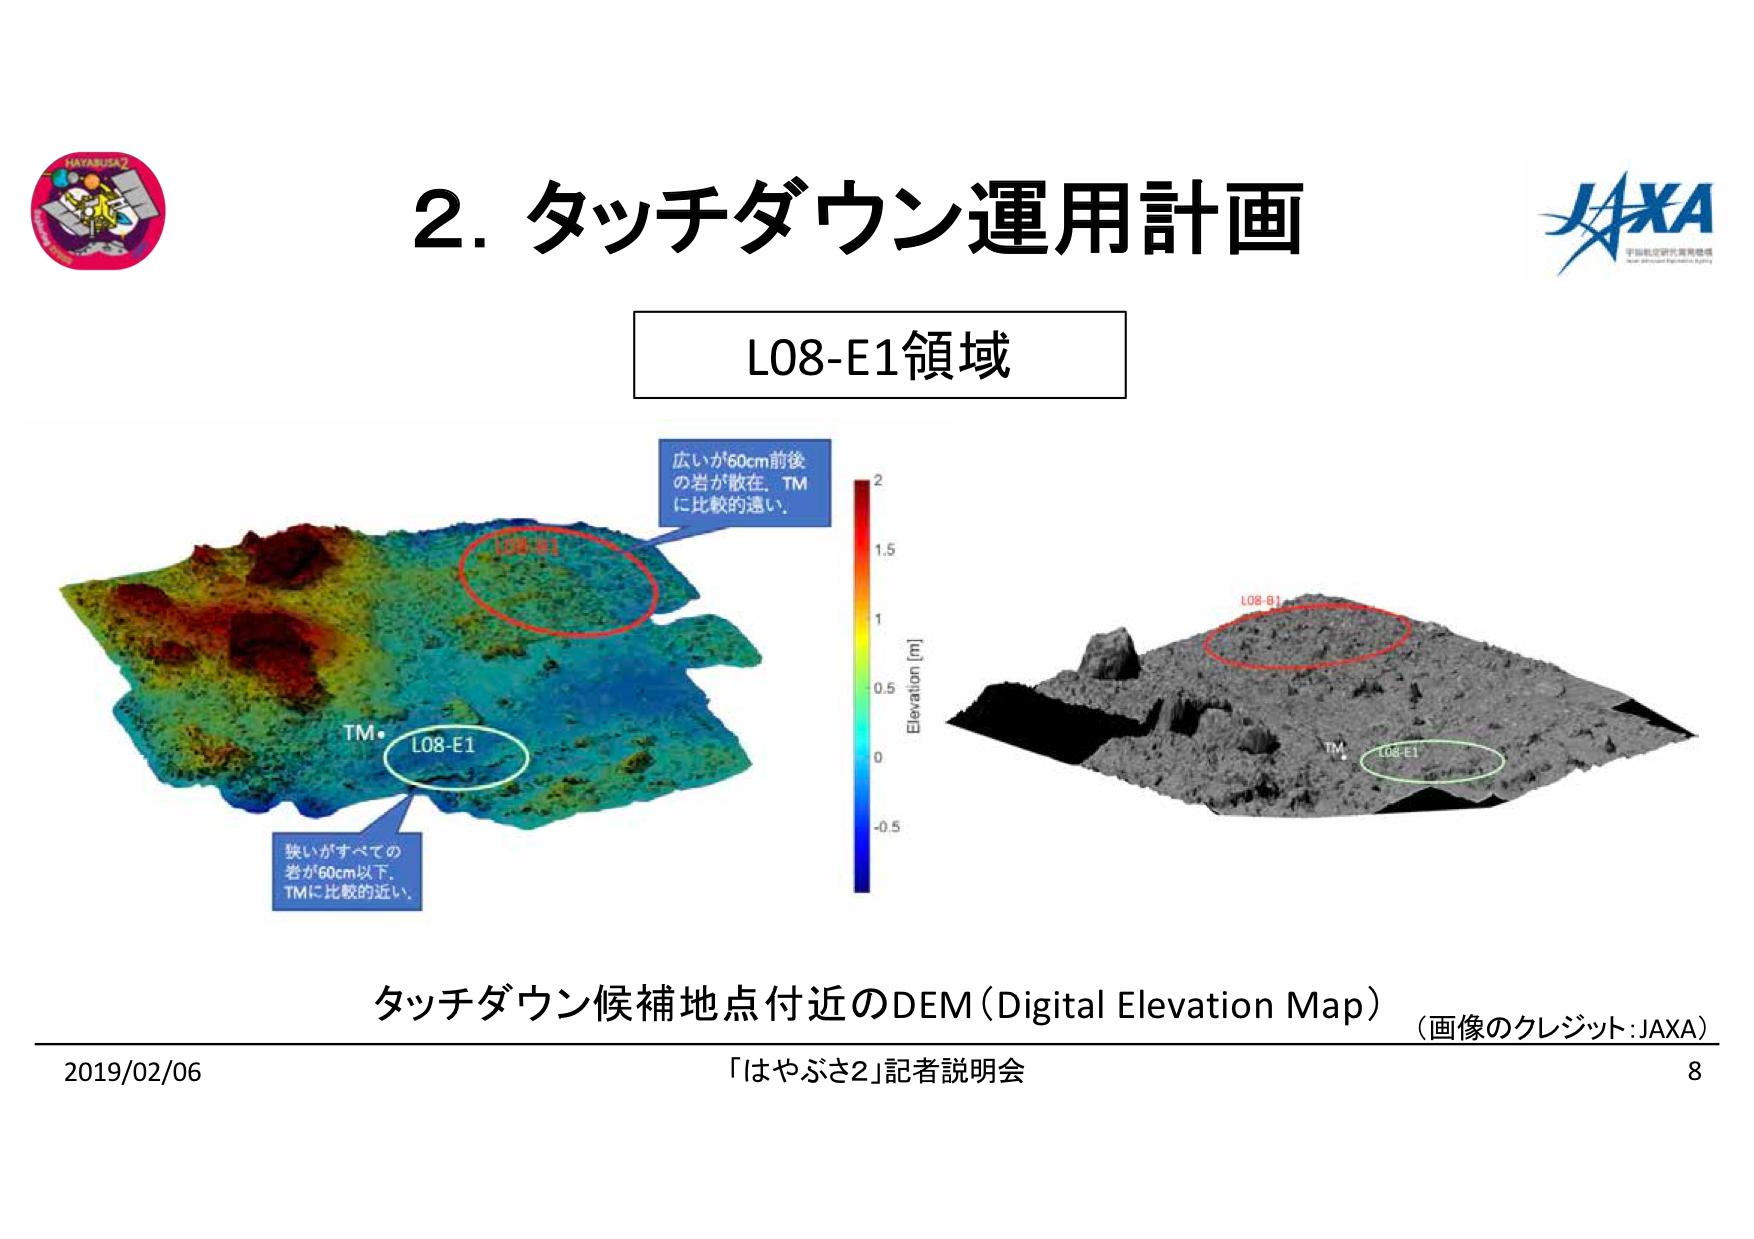 f:id:Imamura:20190204175502p:plain